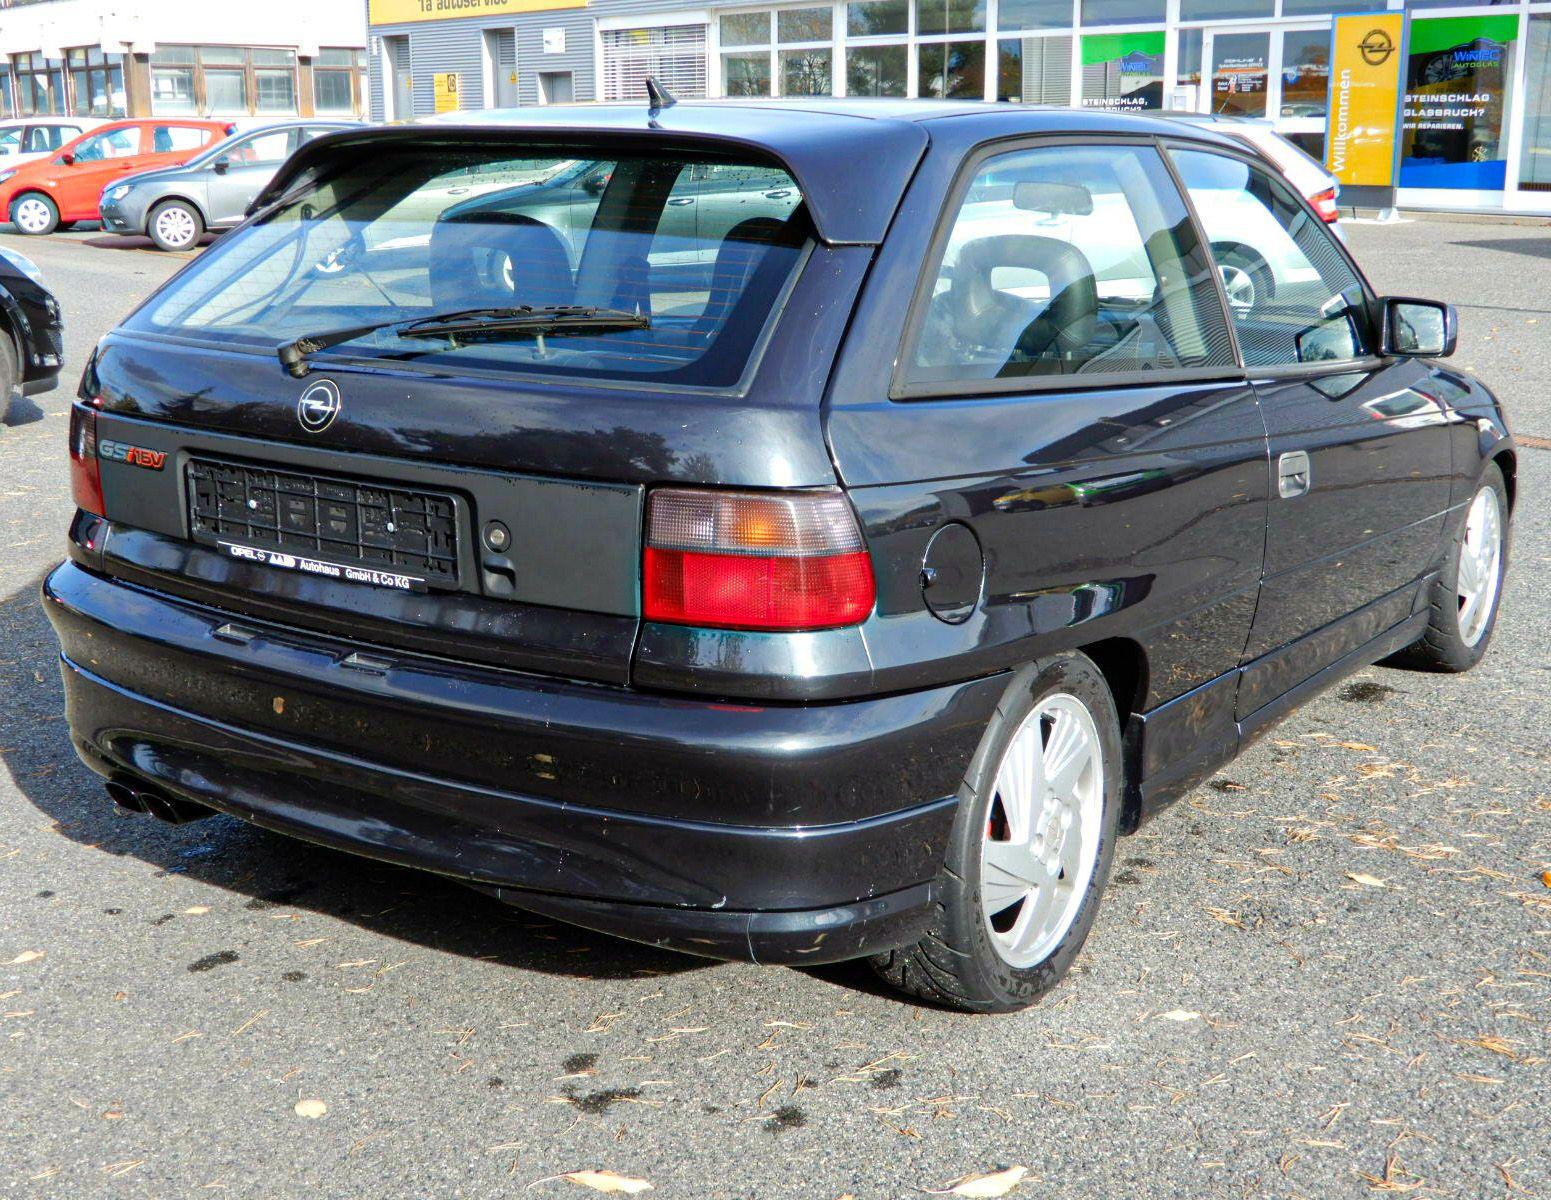 900 Ideeën Over Opel Oldtimers Auto S Jaren 70 Auto S